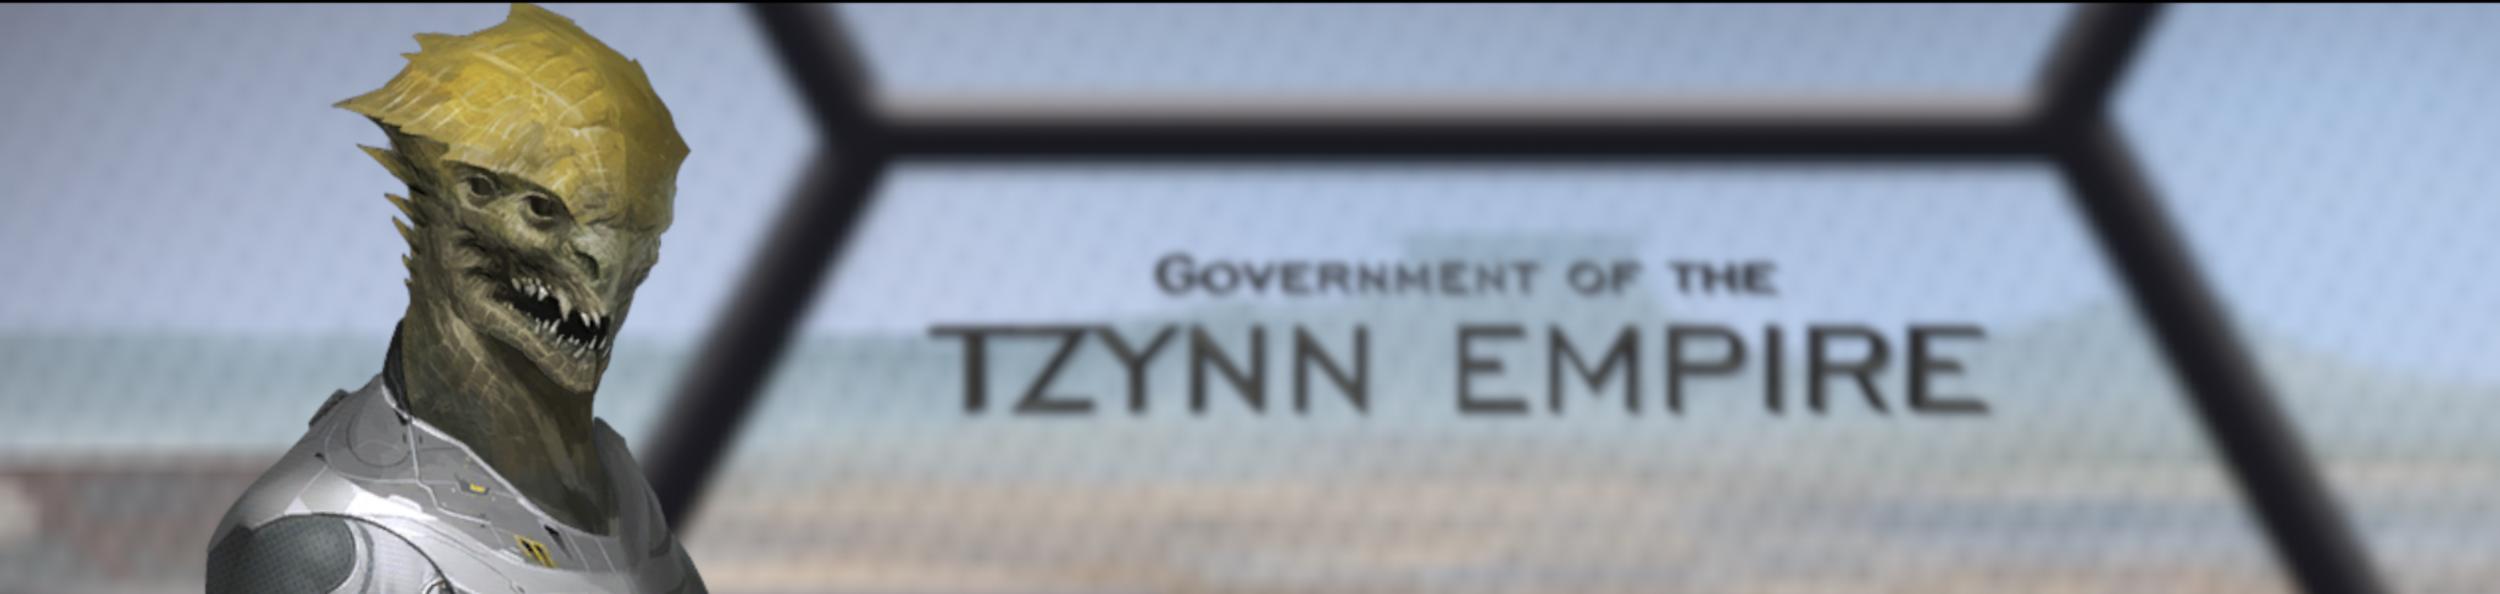 Image: Tzynn government spokesperson Samux.